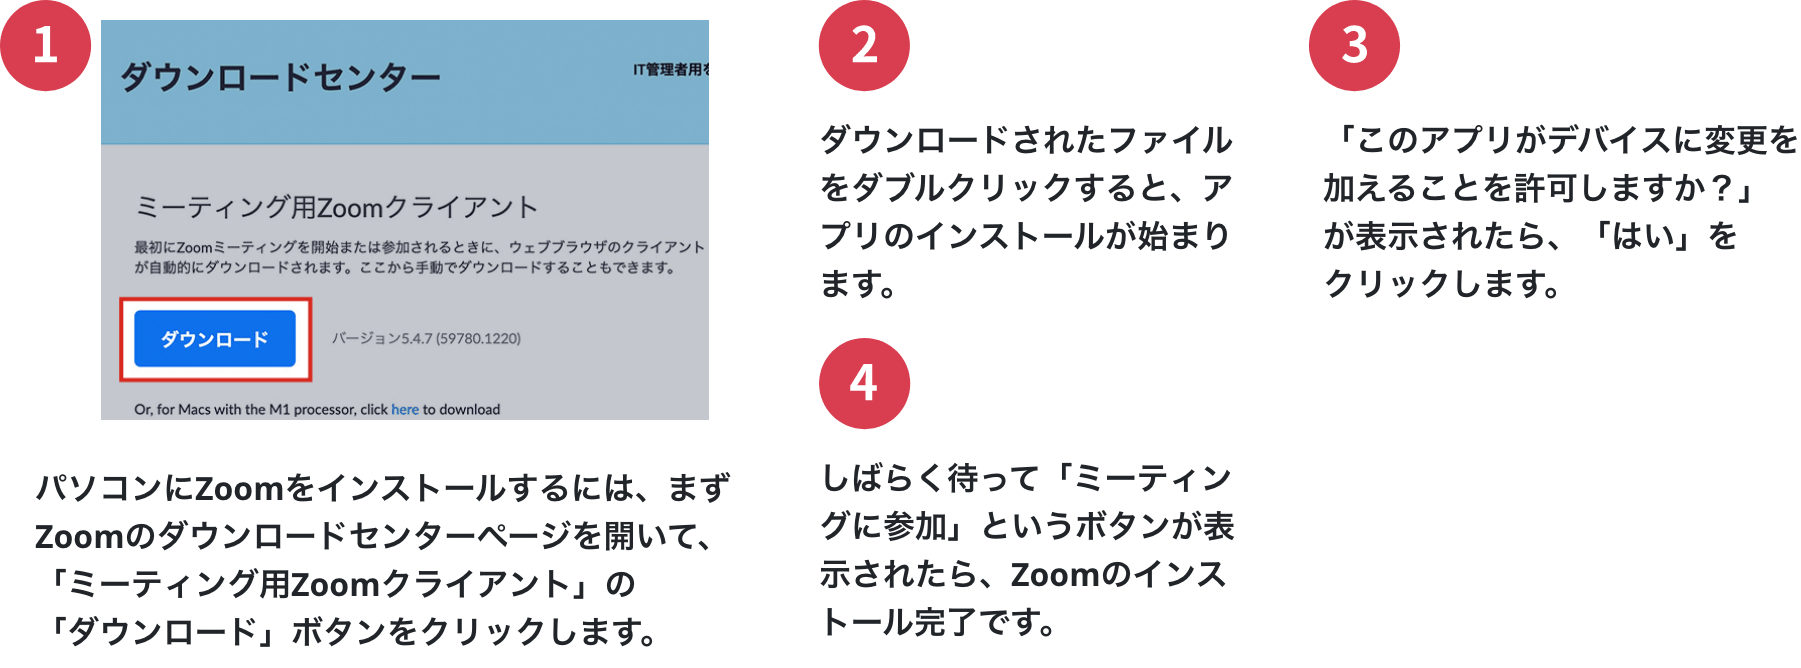 ZoomPCアプリのインストール方法